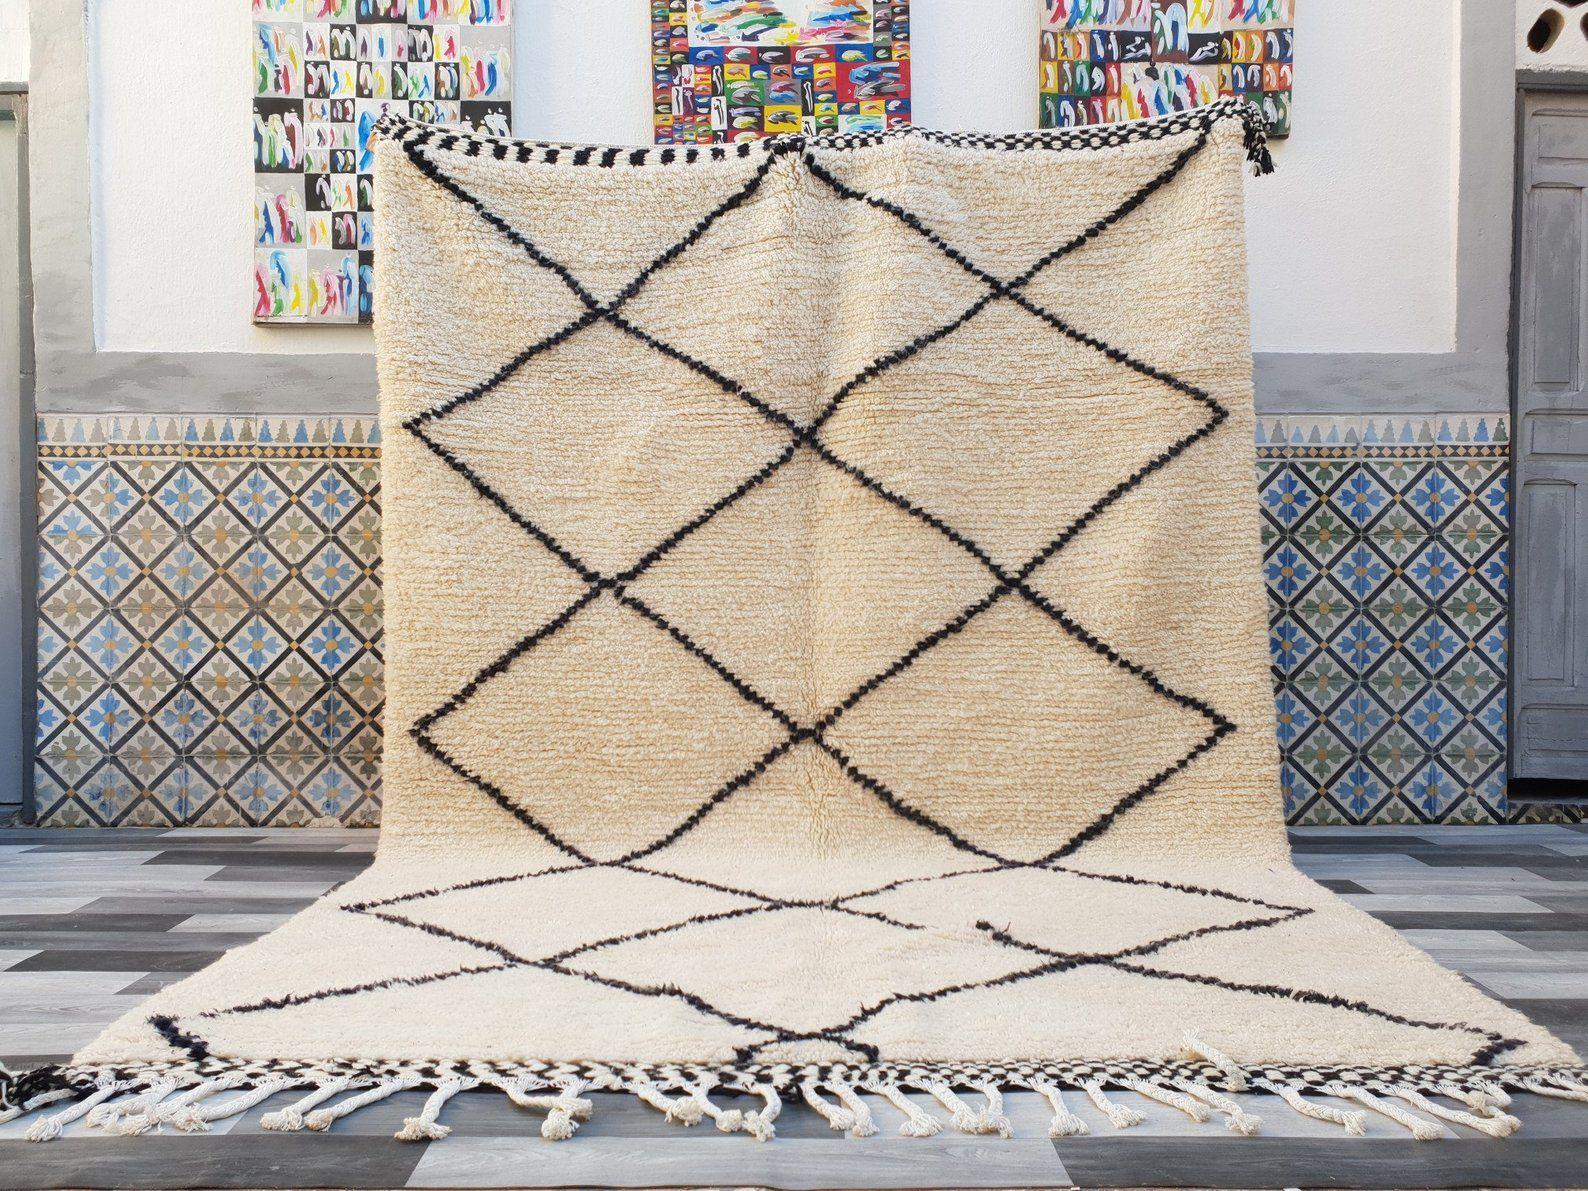 Beni Ourain Teppich 7 Ft X 97 Ft Marokkanischen Wolle Teppich Etsy Teppich Marokkanischer Teppich Wollteppich